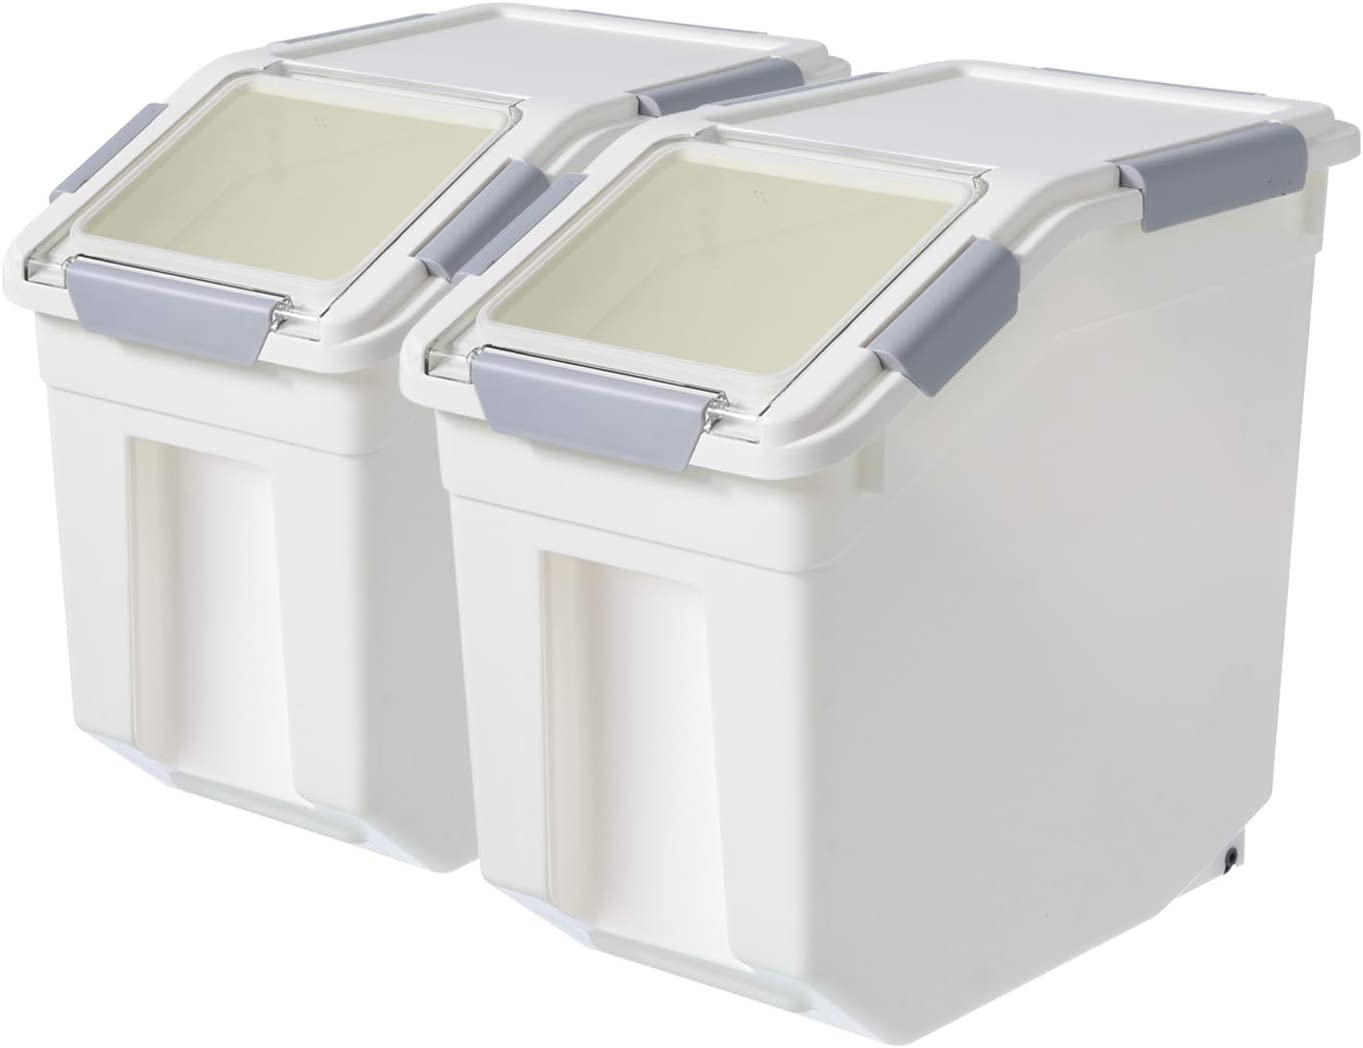 2 Pack Flip Top Pantry Storage With Scoop,Airtight Rice Bin Storage,Dry Food,Sugar, Baking Supplies,Pet Food Storage Container,Flour,Dog Cat Birds Food Bin,BPA Free (25LB)